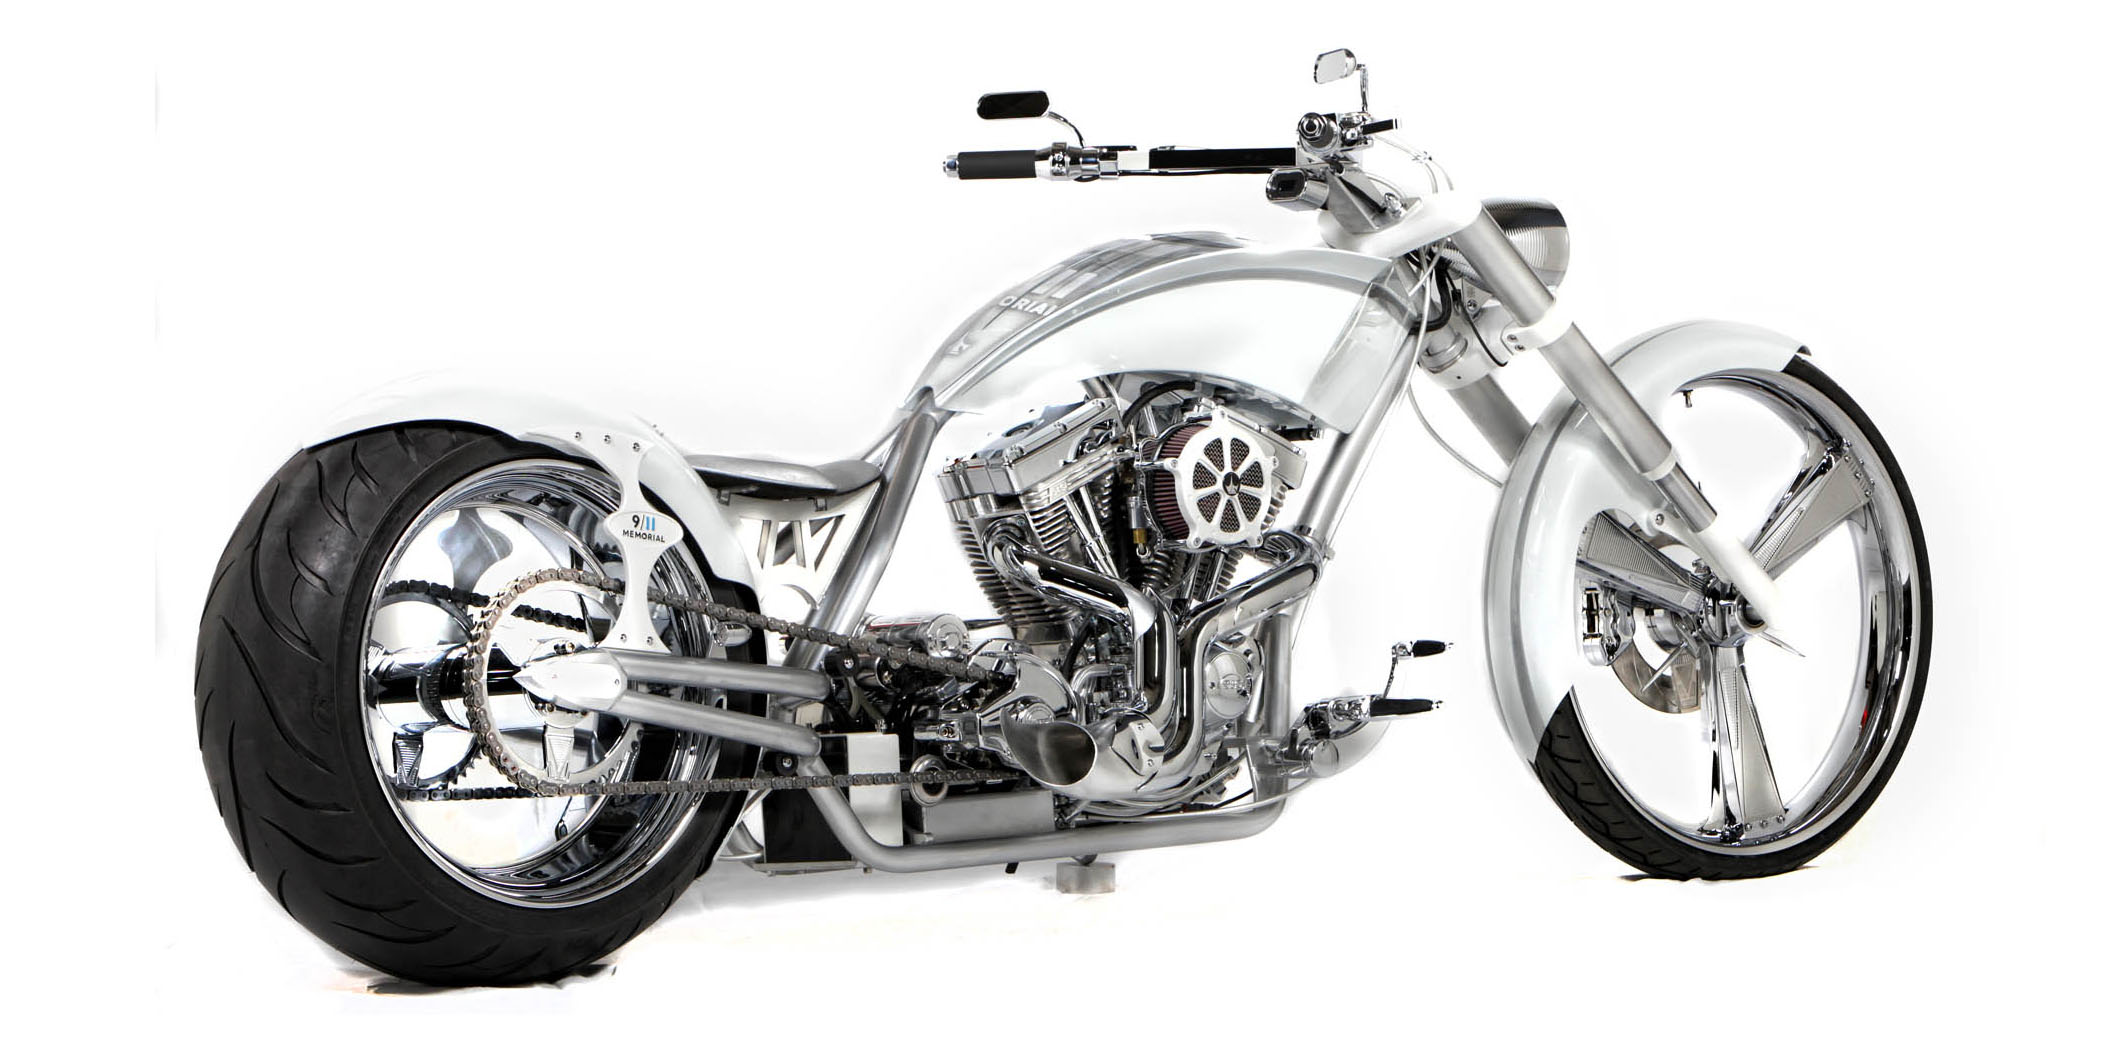 paul-jr-designs-911-giveaway-bike-009